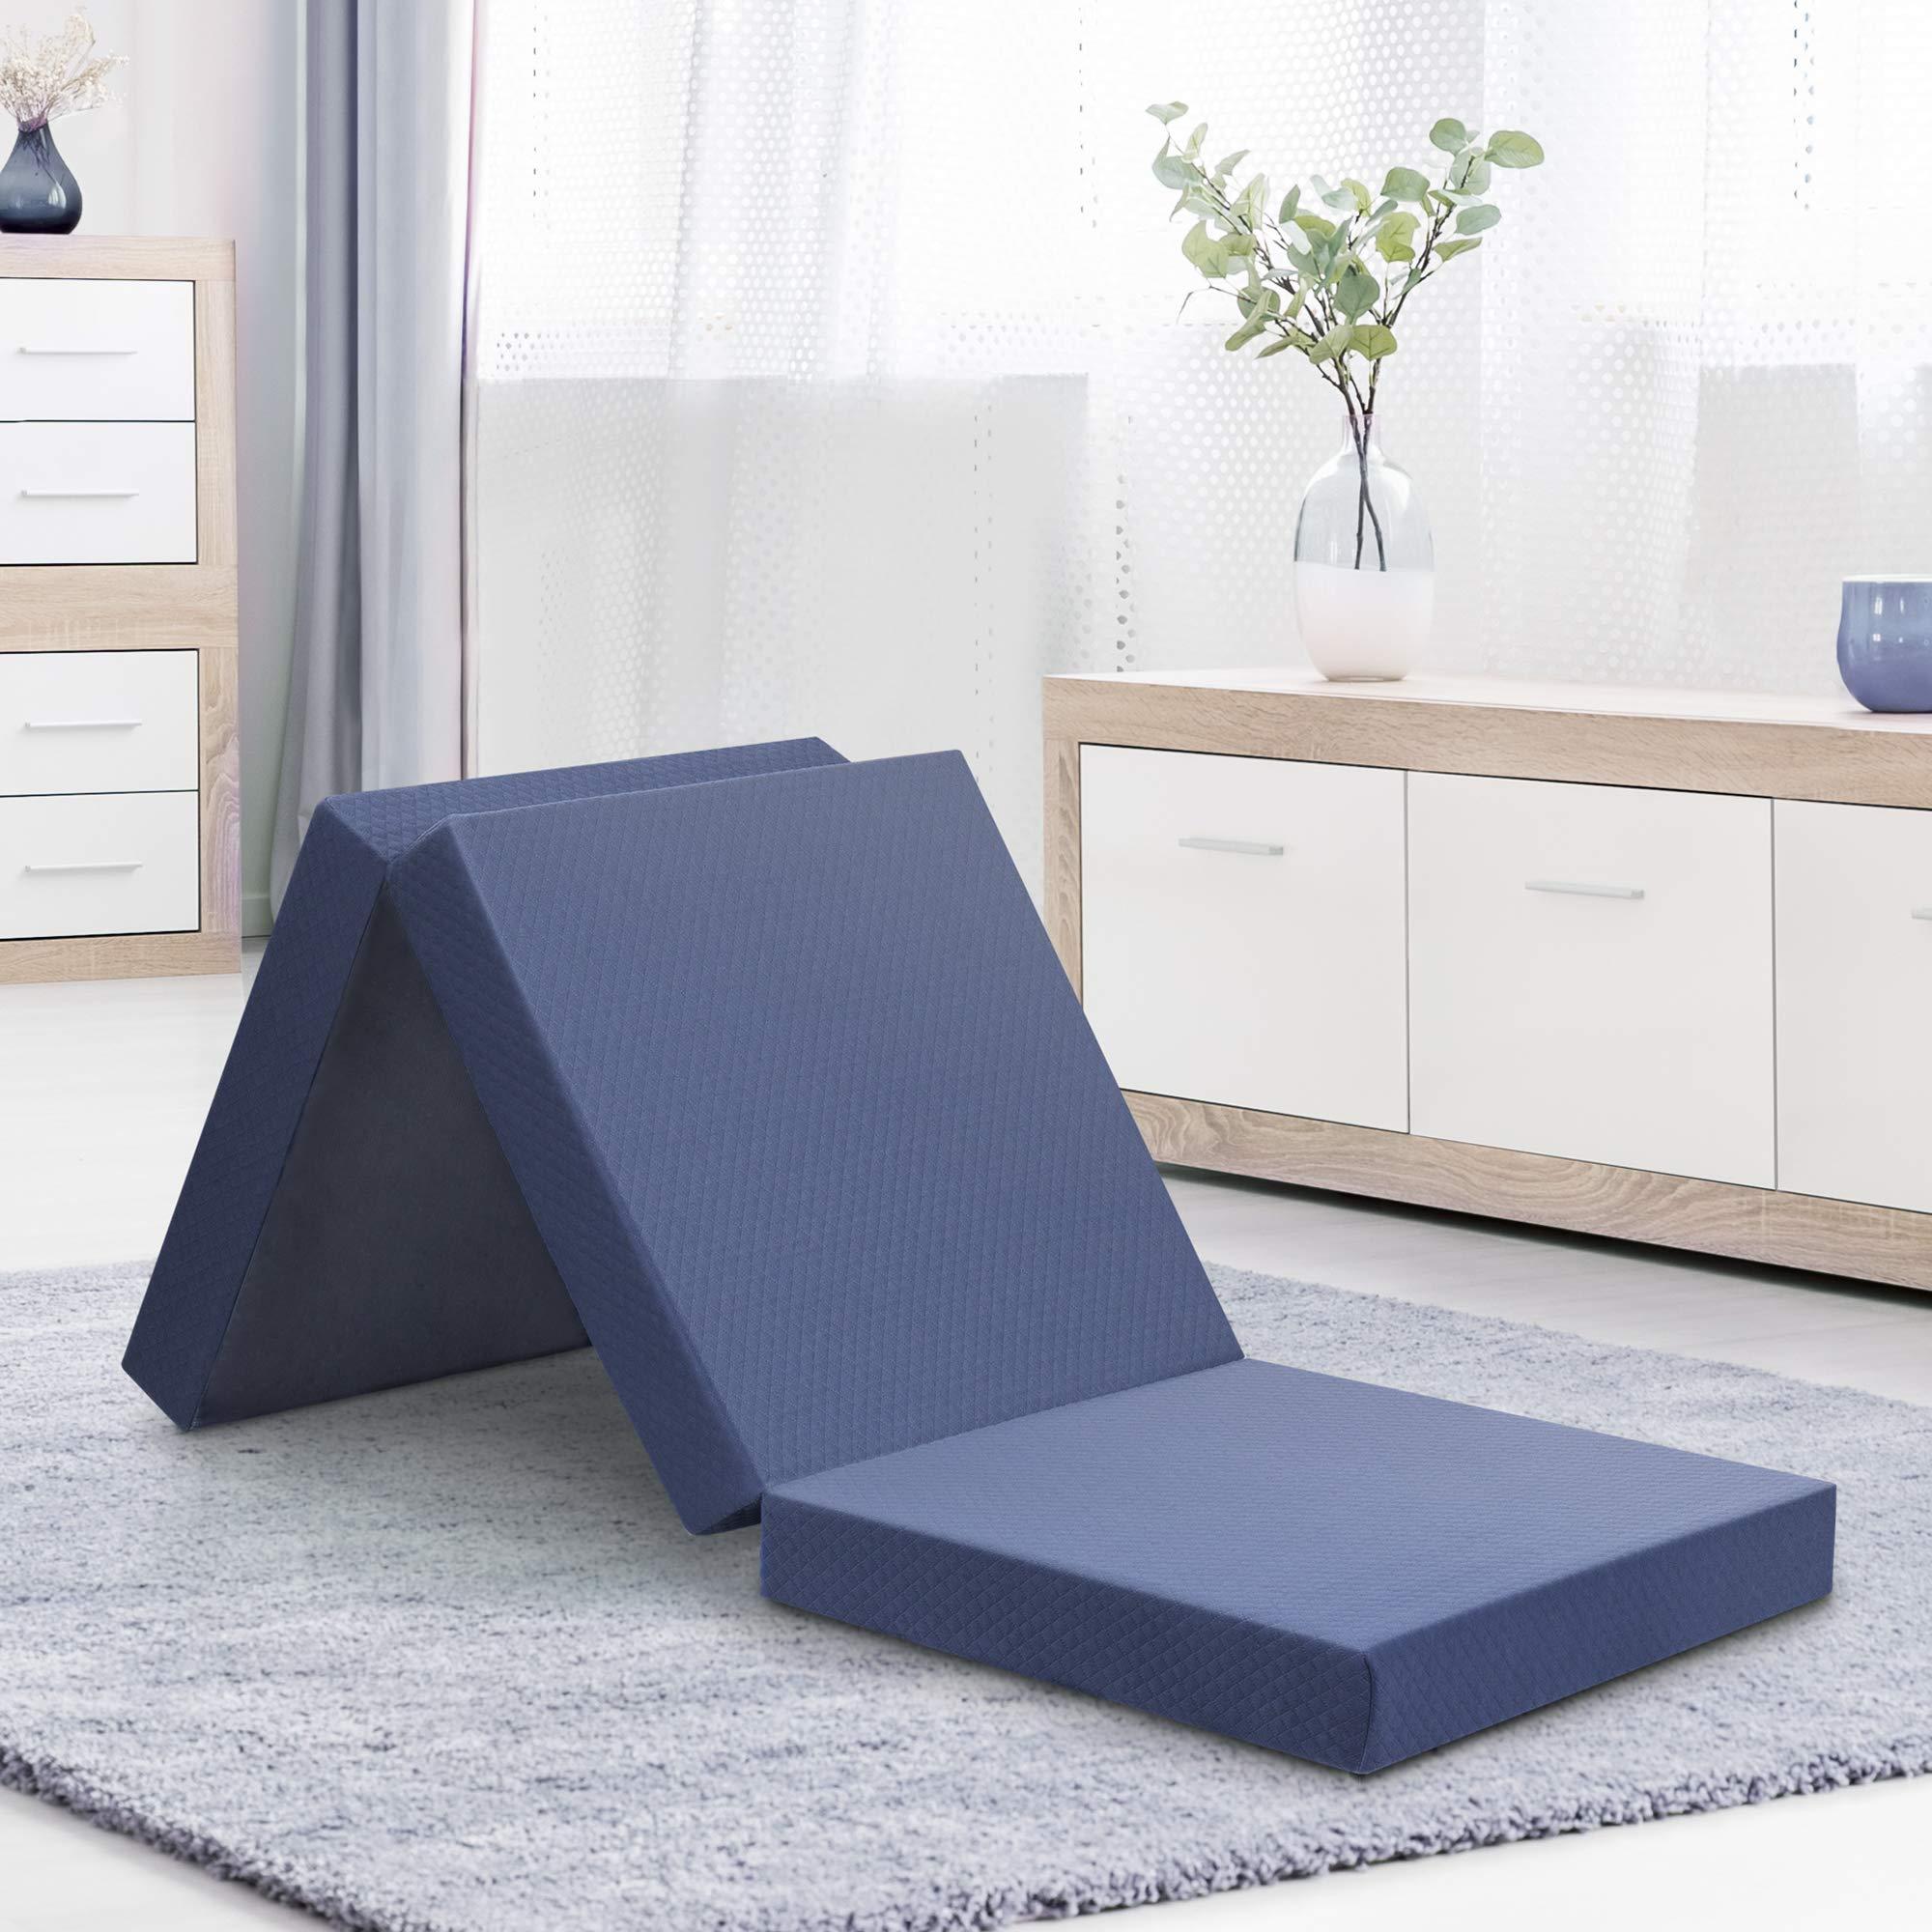 Olee Sleep  Topper Tri-Folding Memory Foam, 4 Inch, Grey